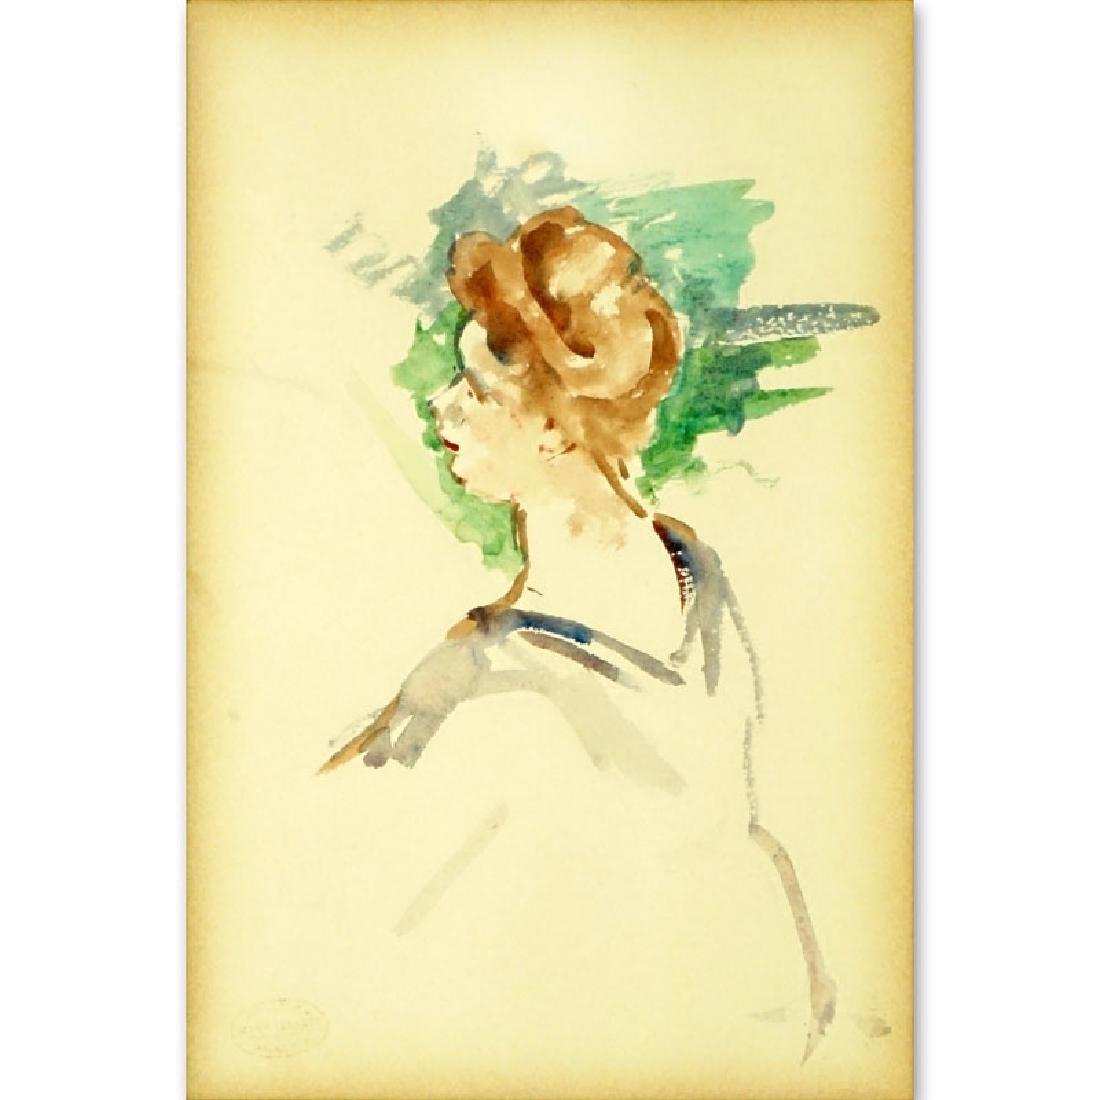 Mary Cassatt, American (1844-1926) Watercolor on paper